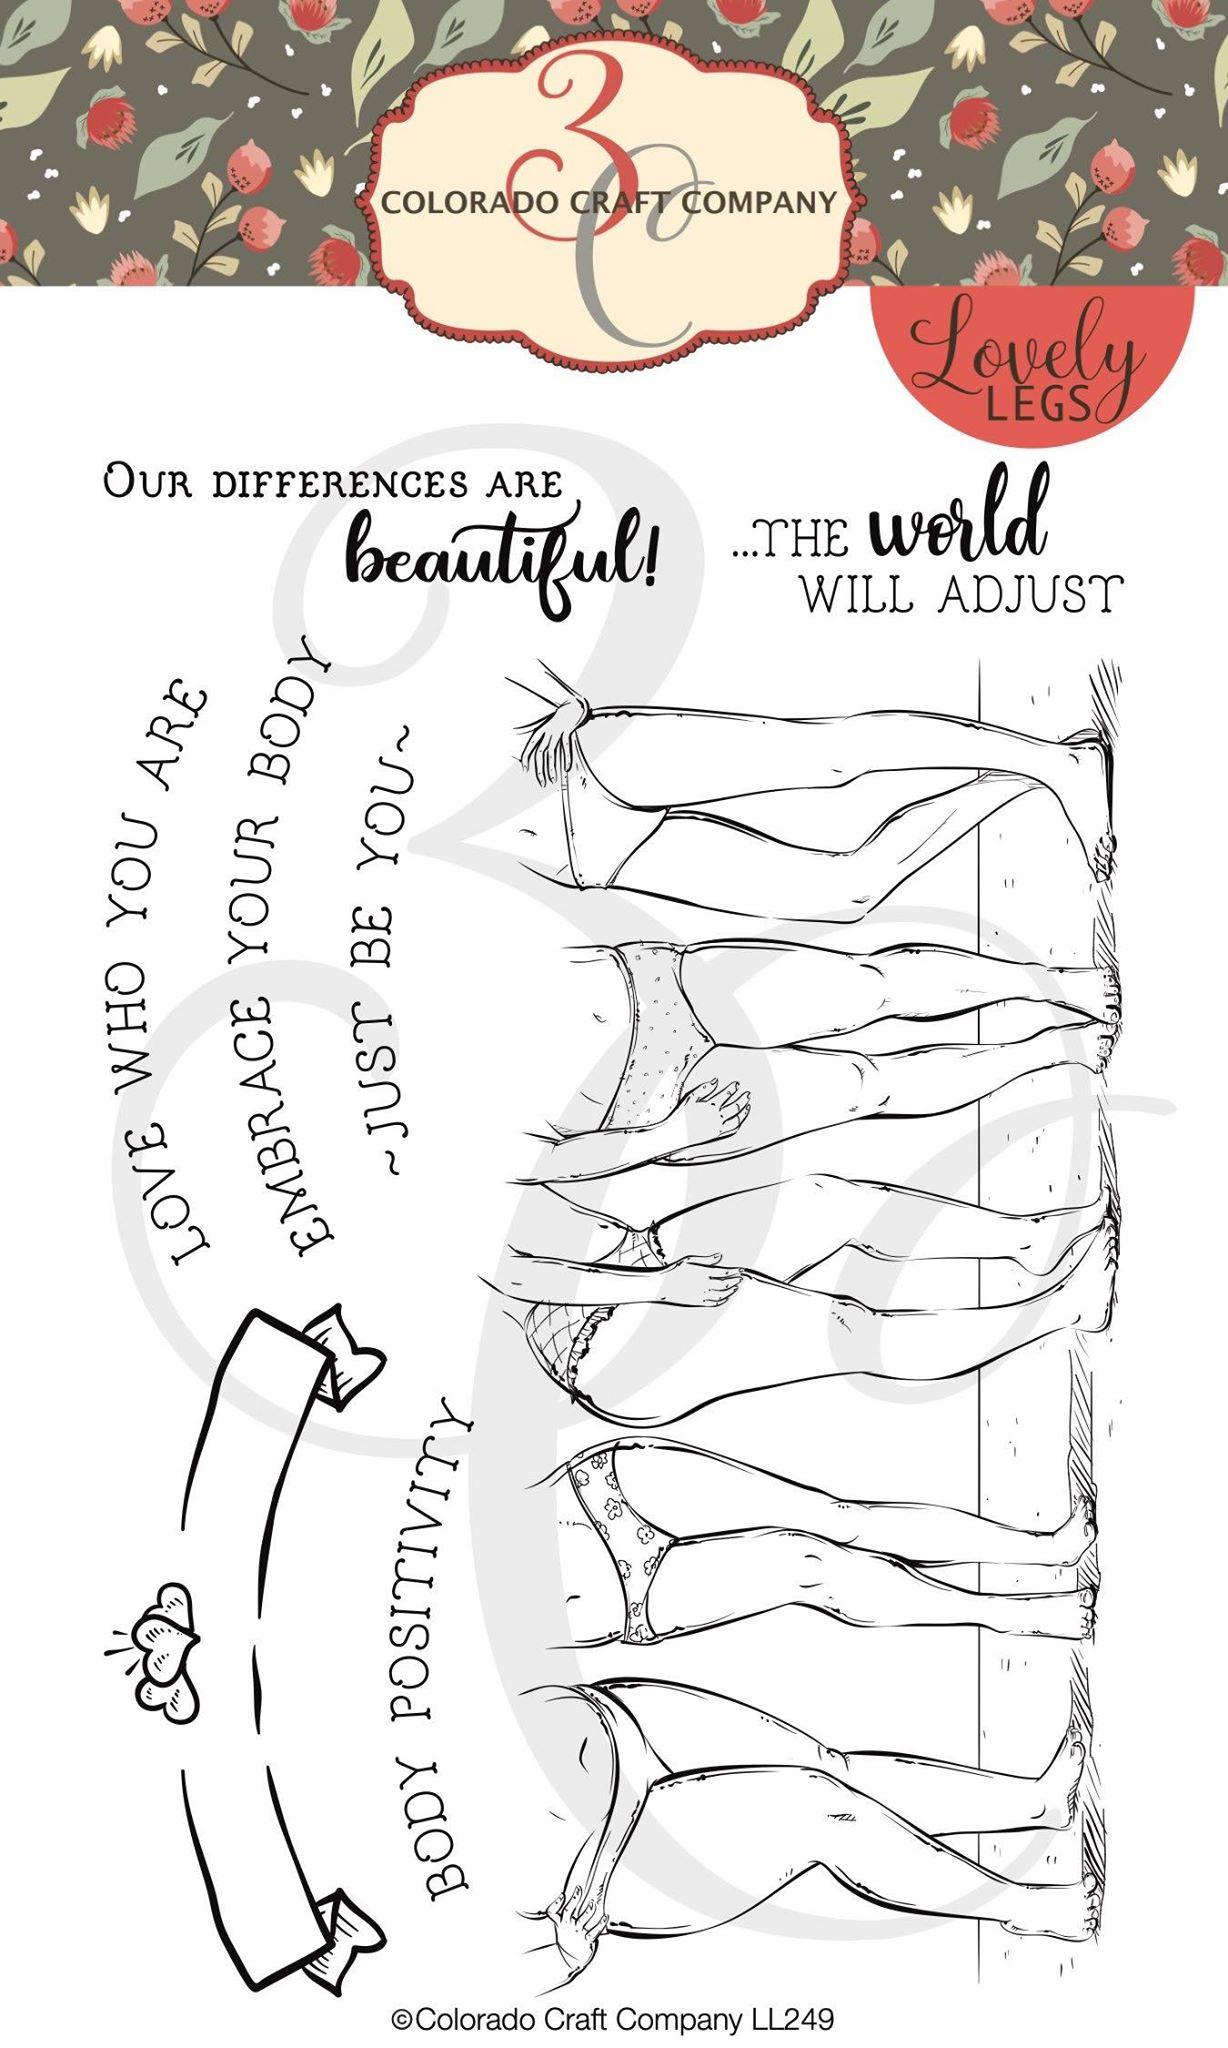 Colorado Craft Co. - Lovely Legs Body Positivity Stamp Set